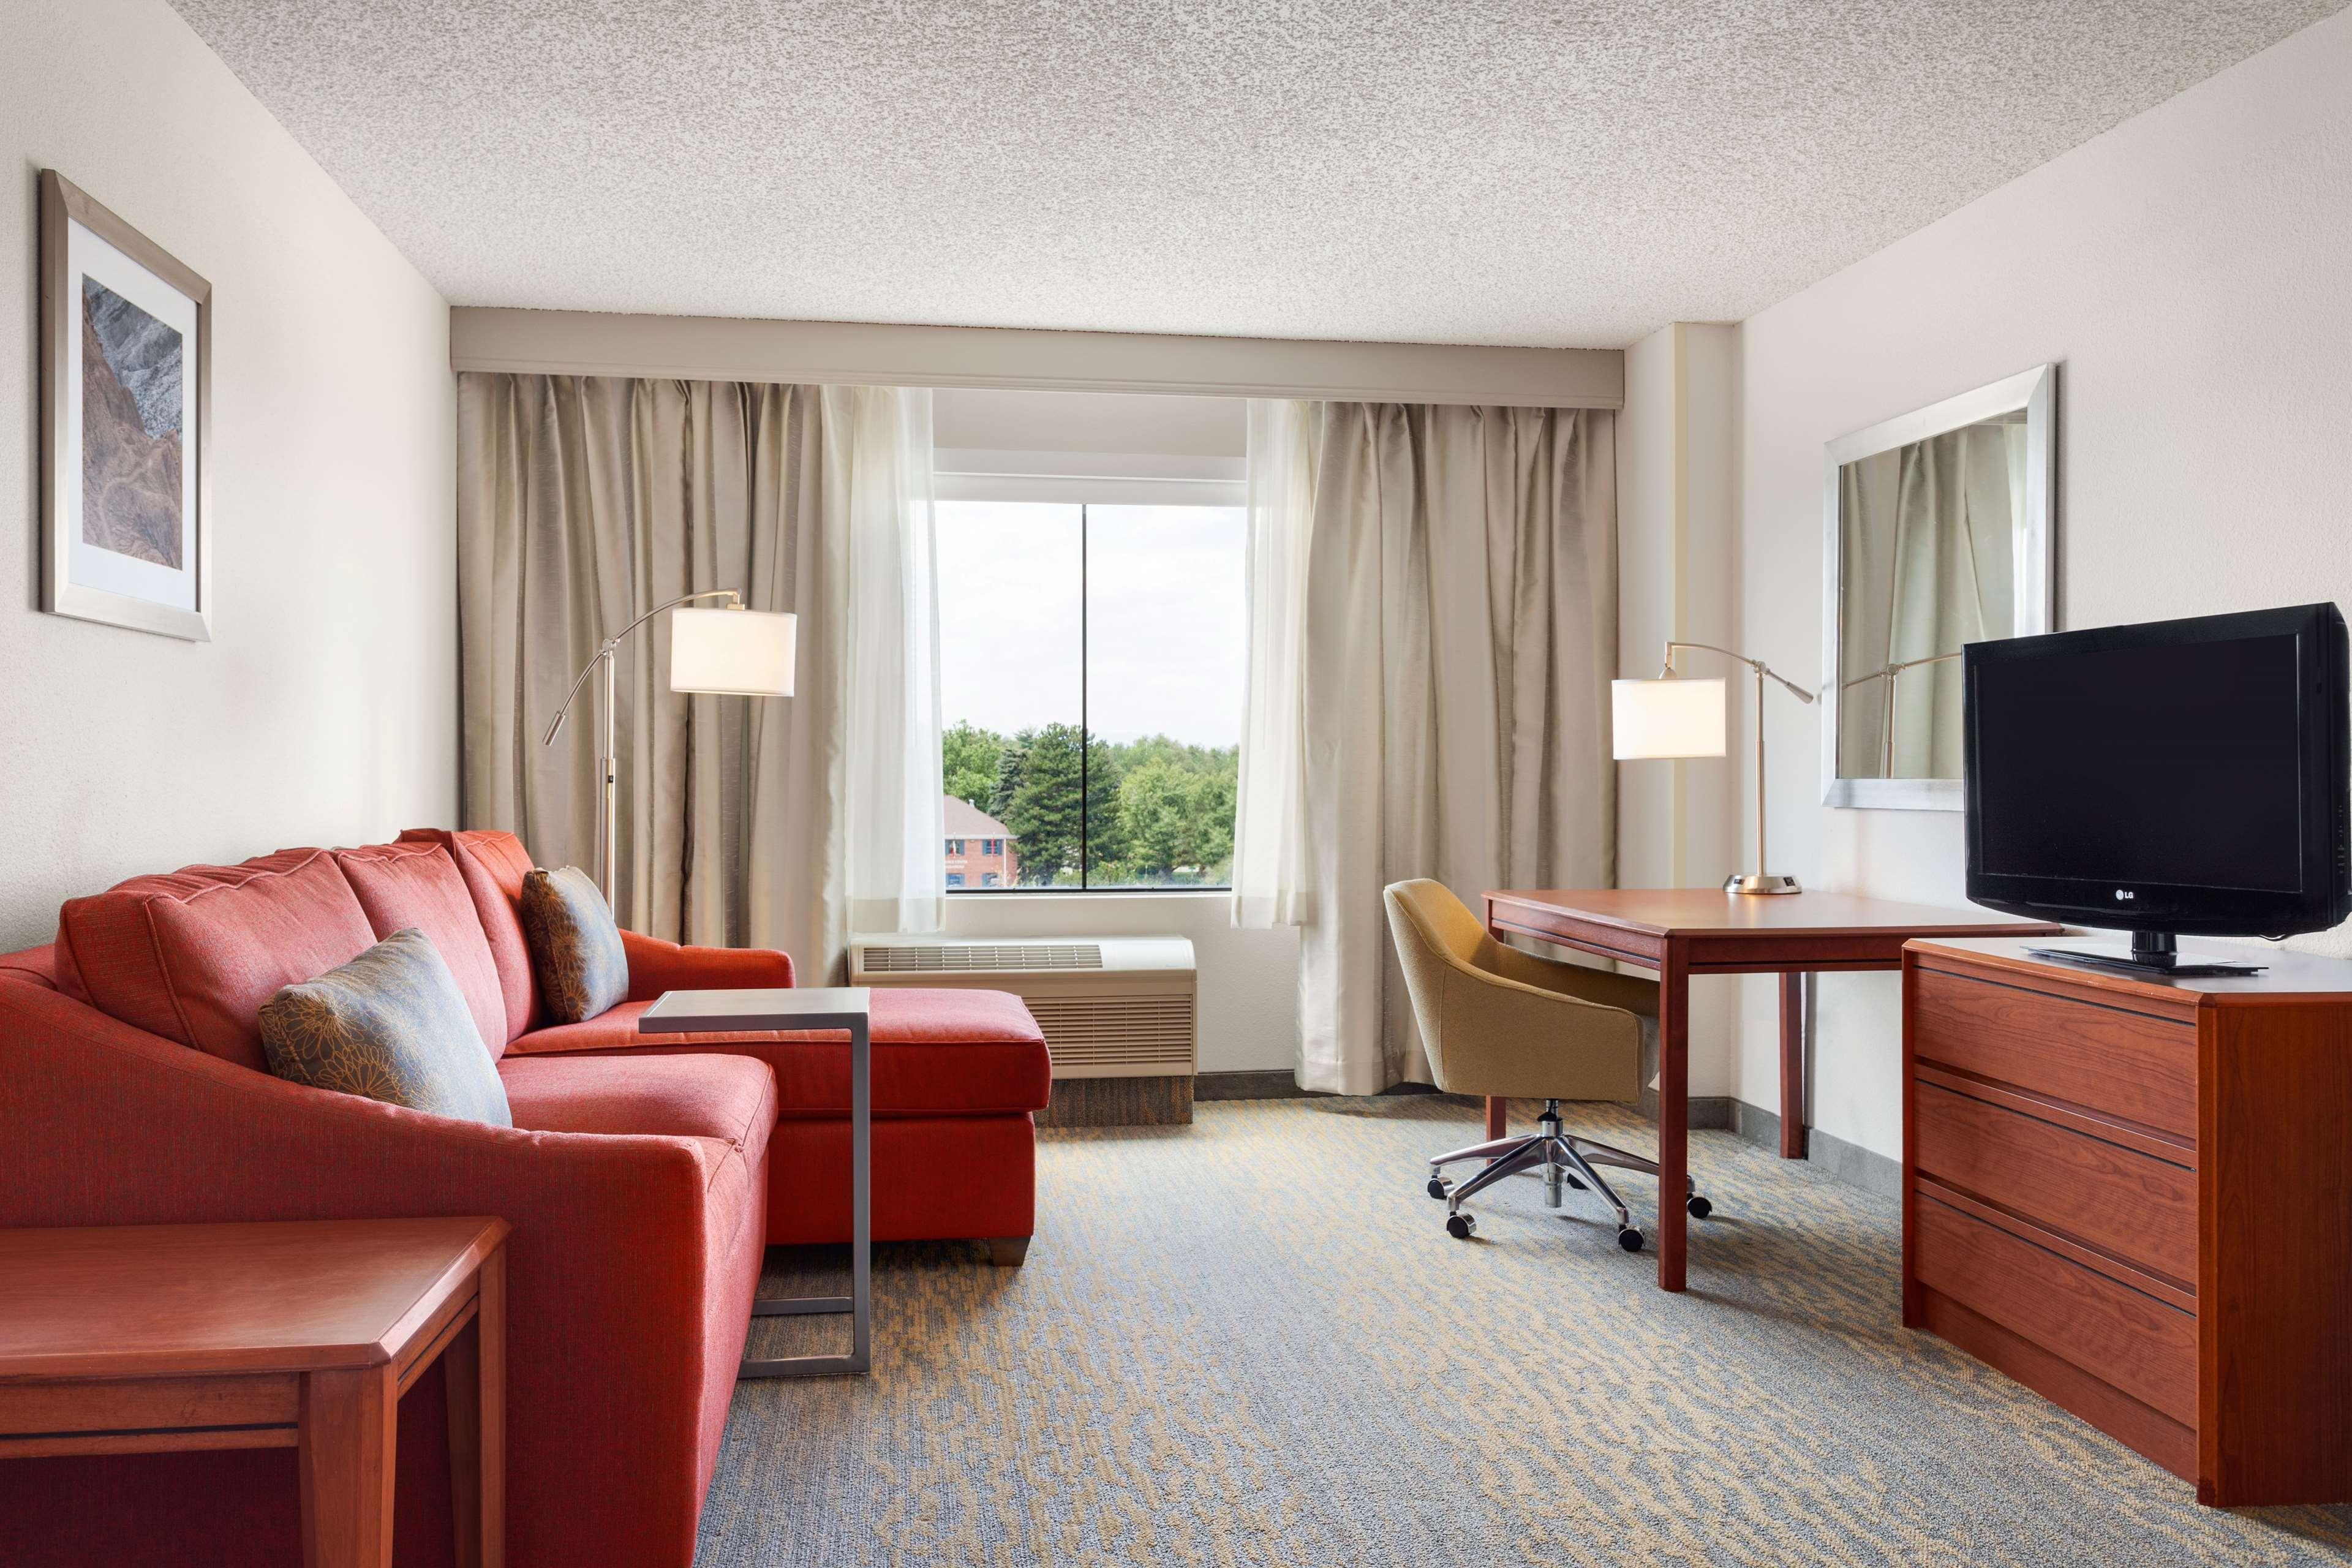 Hampton Inn & Suites Denver-Cherry Creek image 24